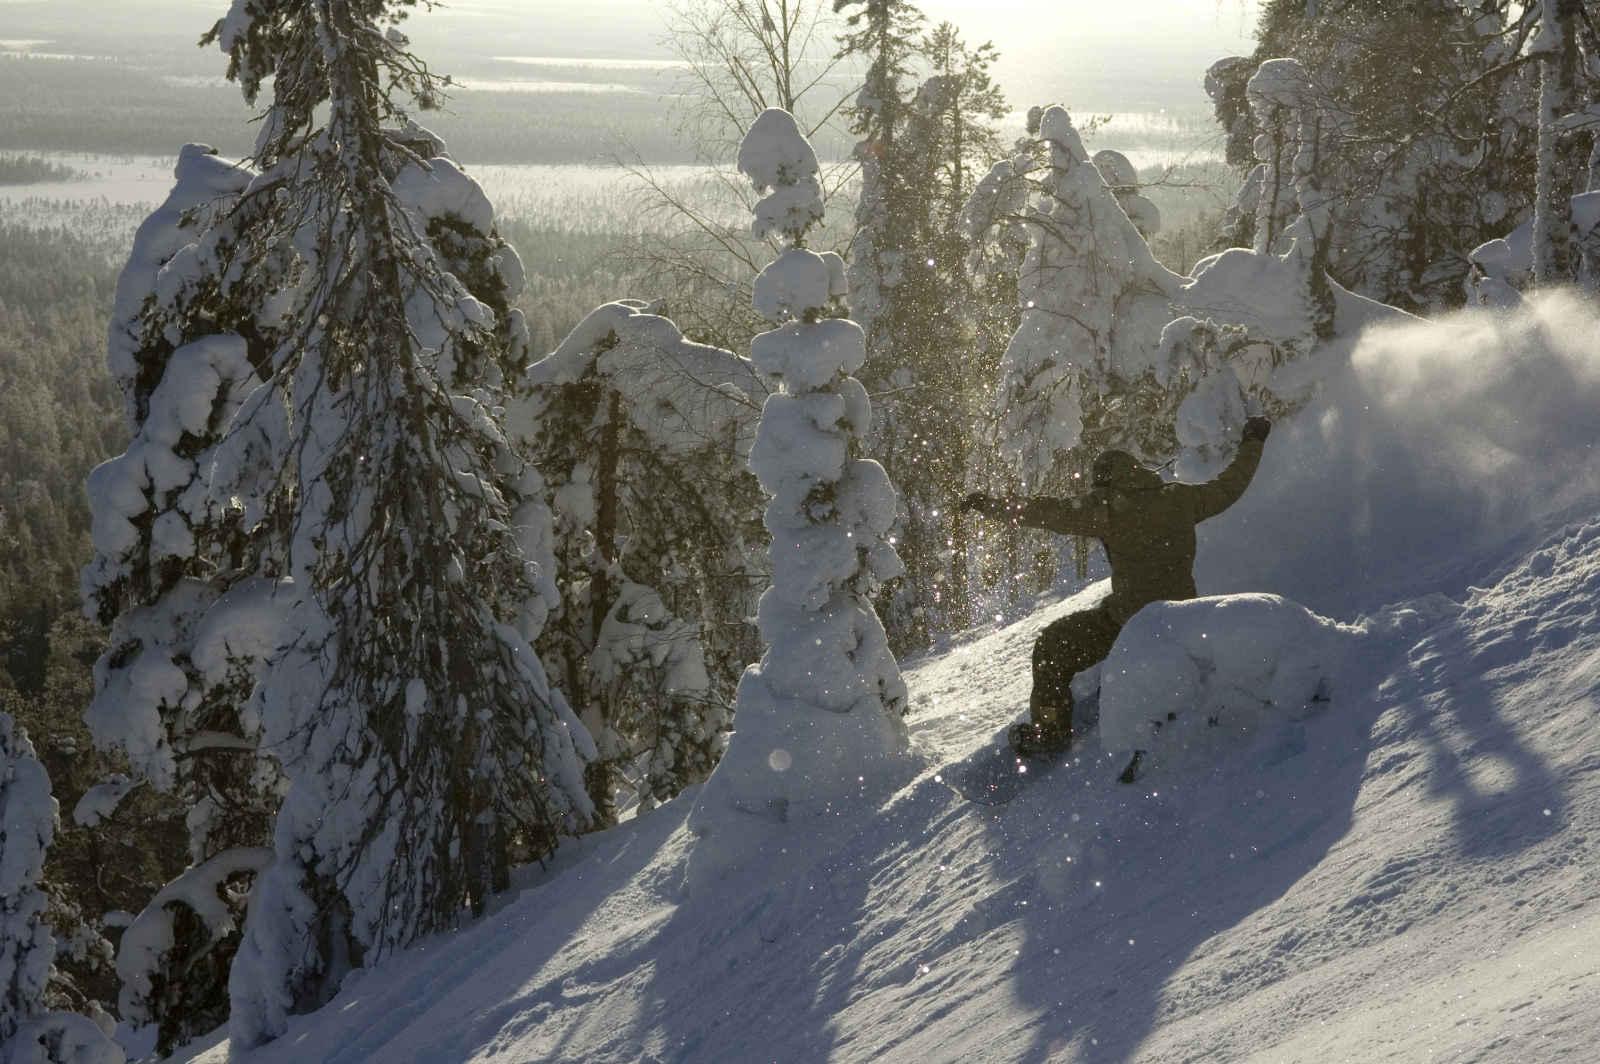 Finlande - Laponie - Luosto - Les Chalets de Luosto